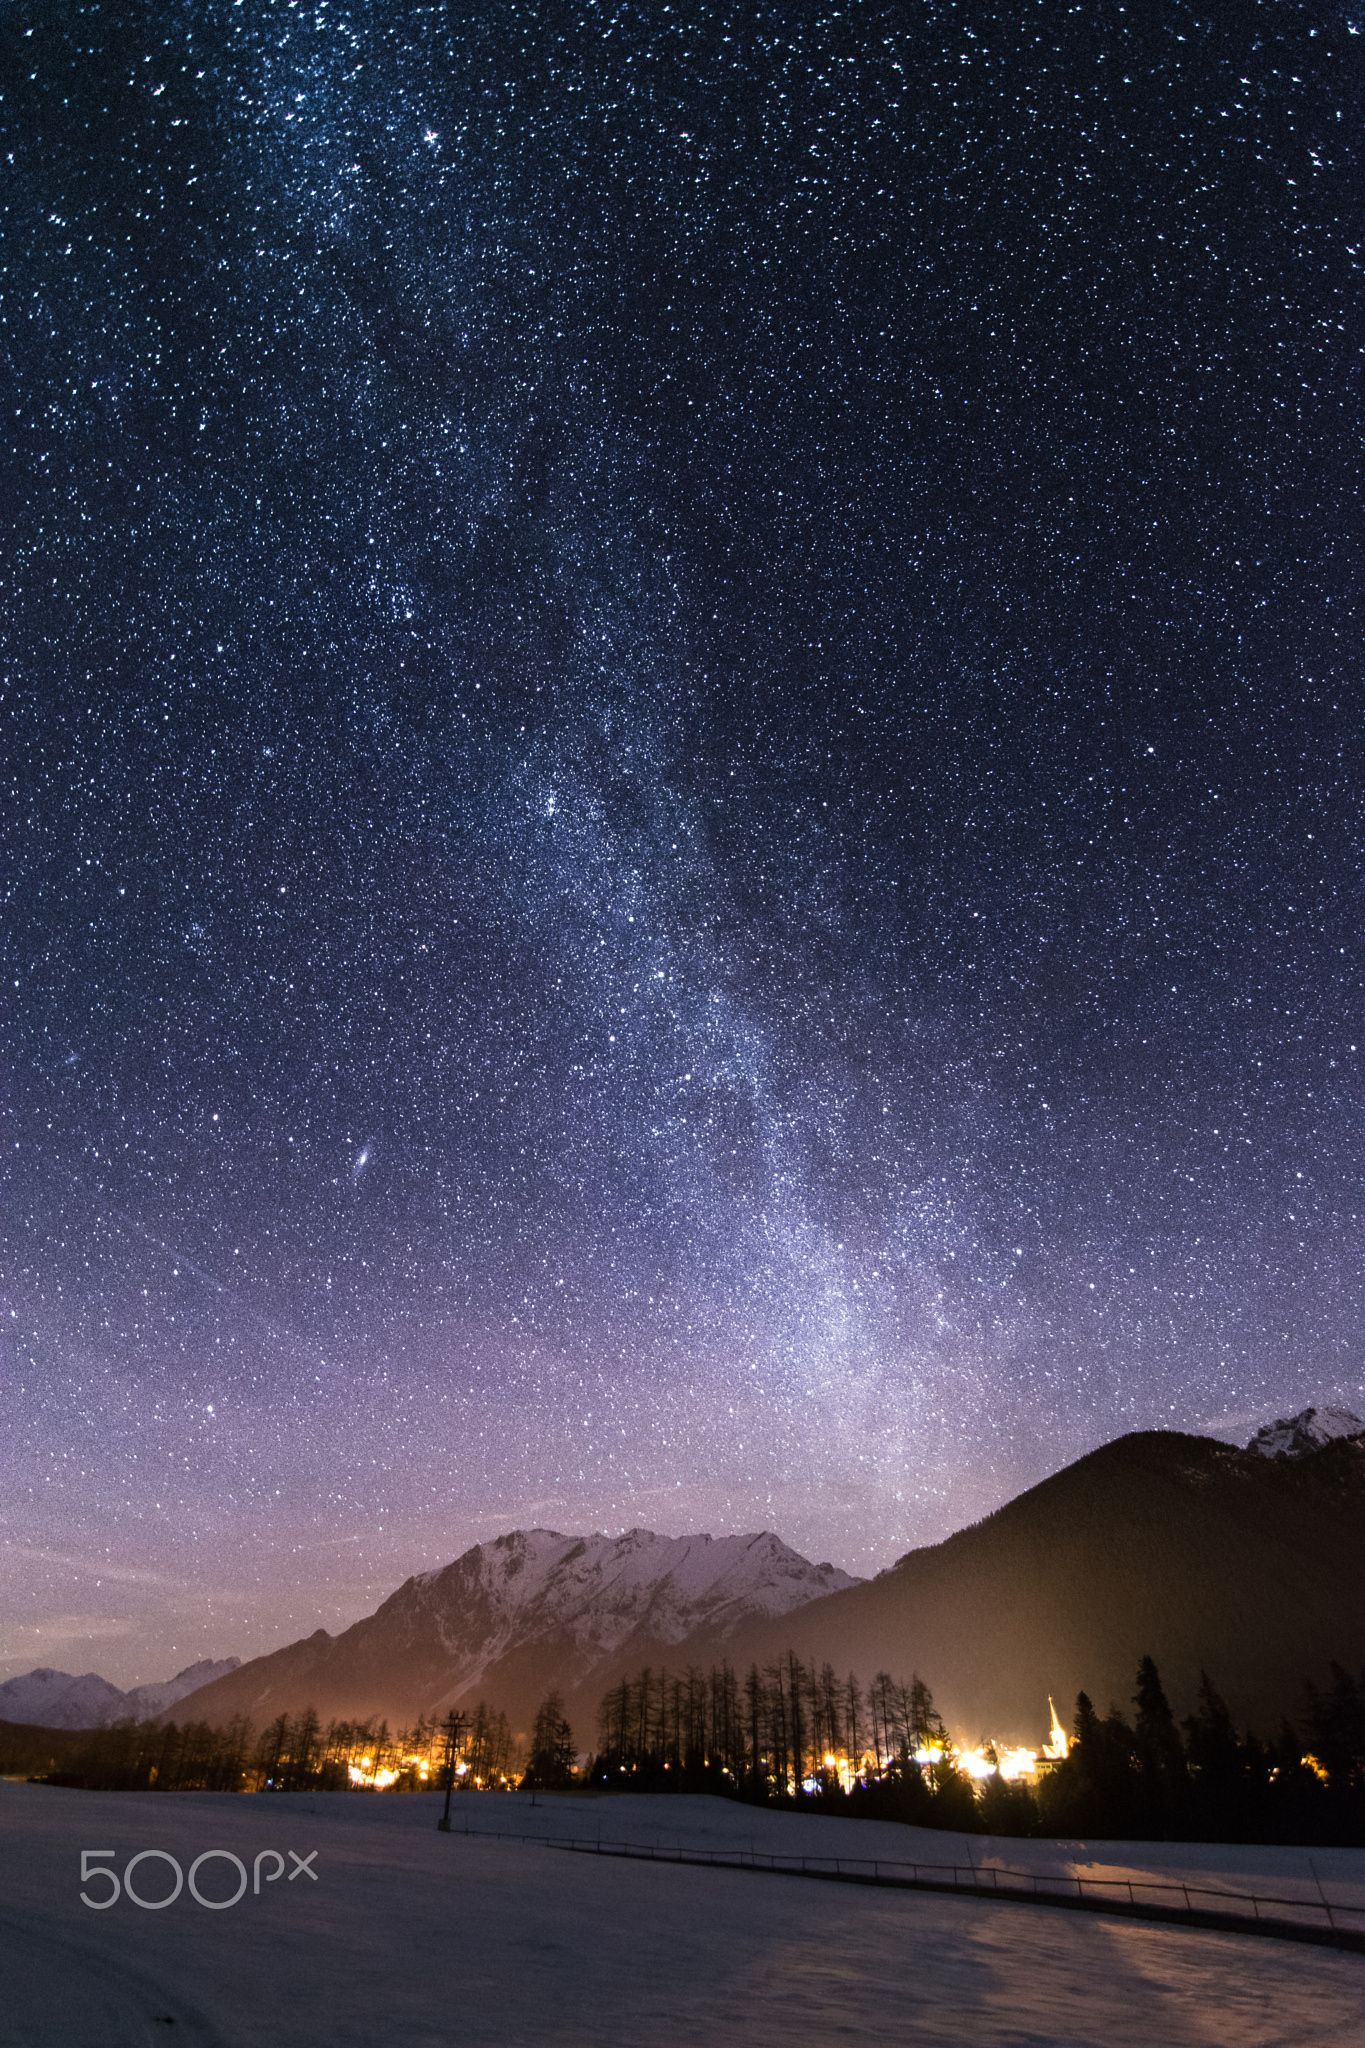 Milky Way Milky Way Landscape Nightscape Starry sky milky way landscape night